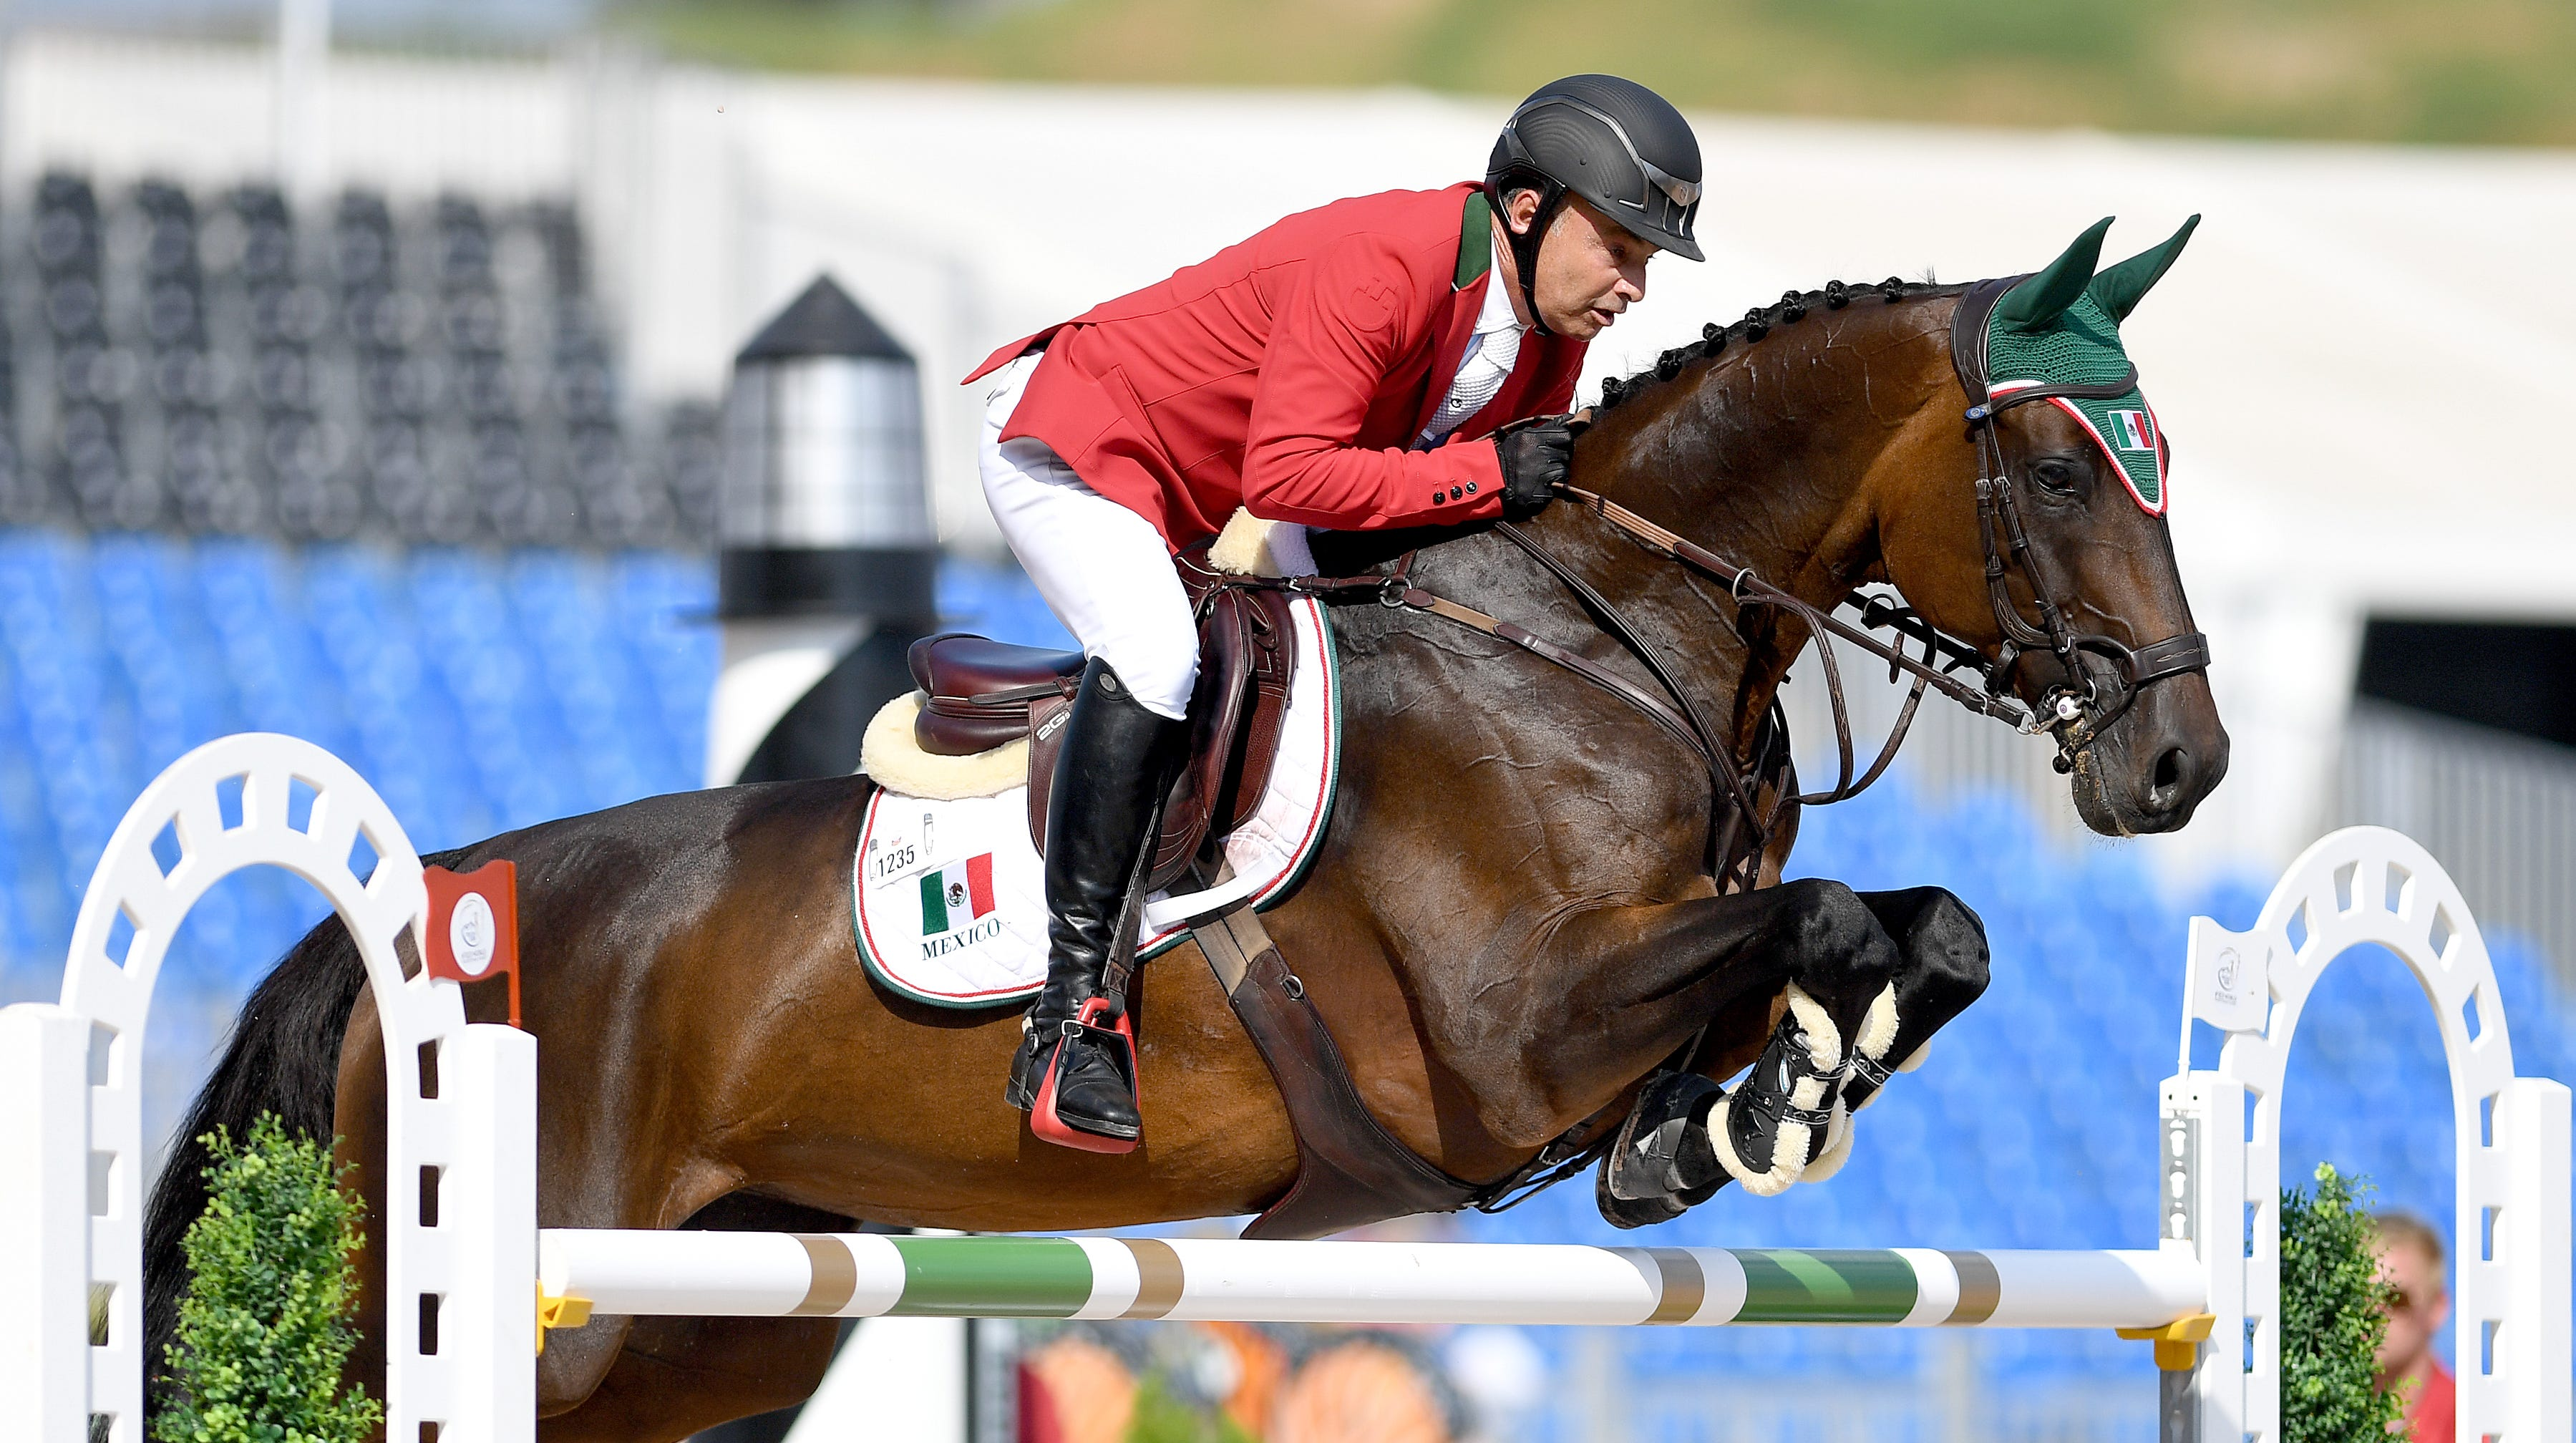 World Equestrian Games team jumping